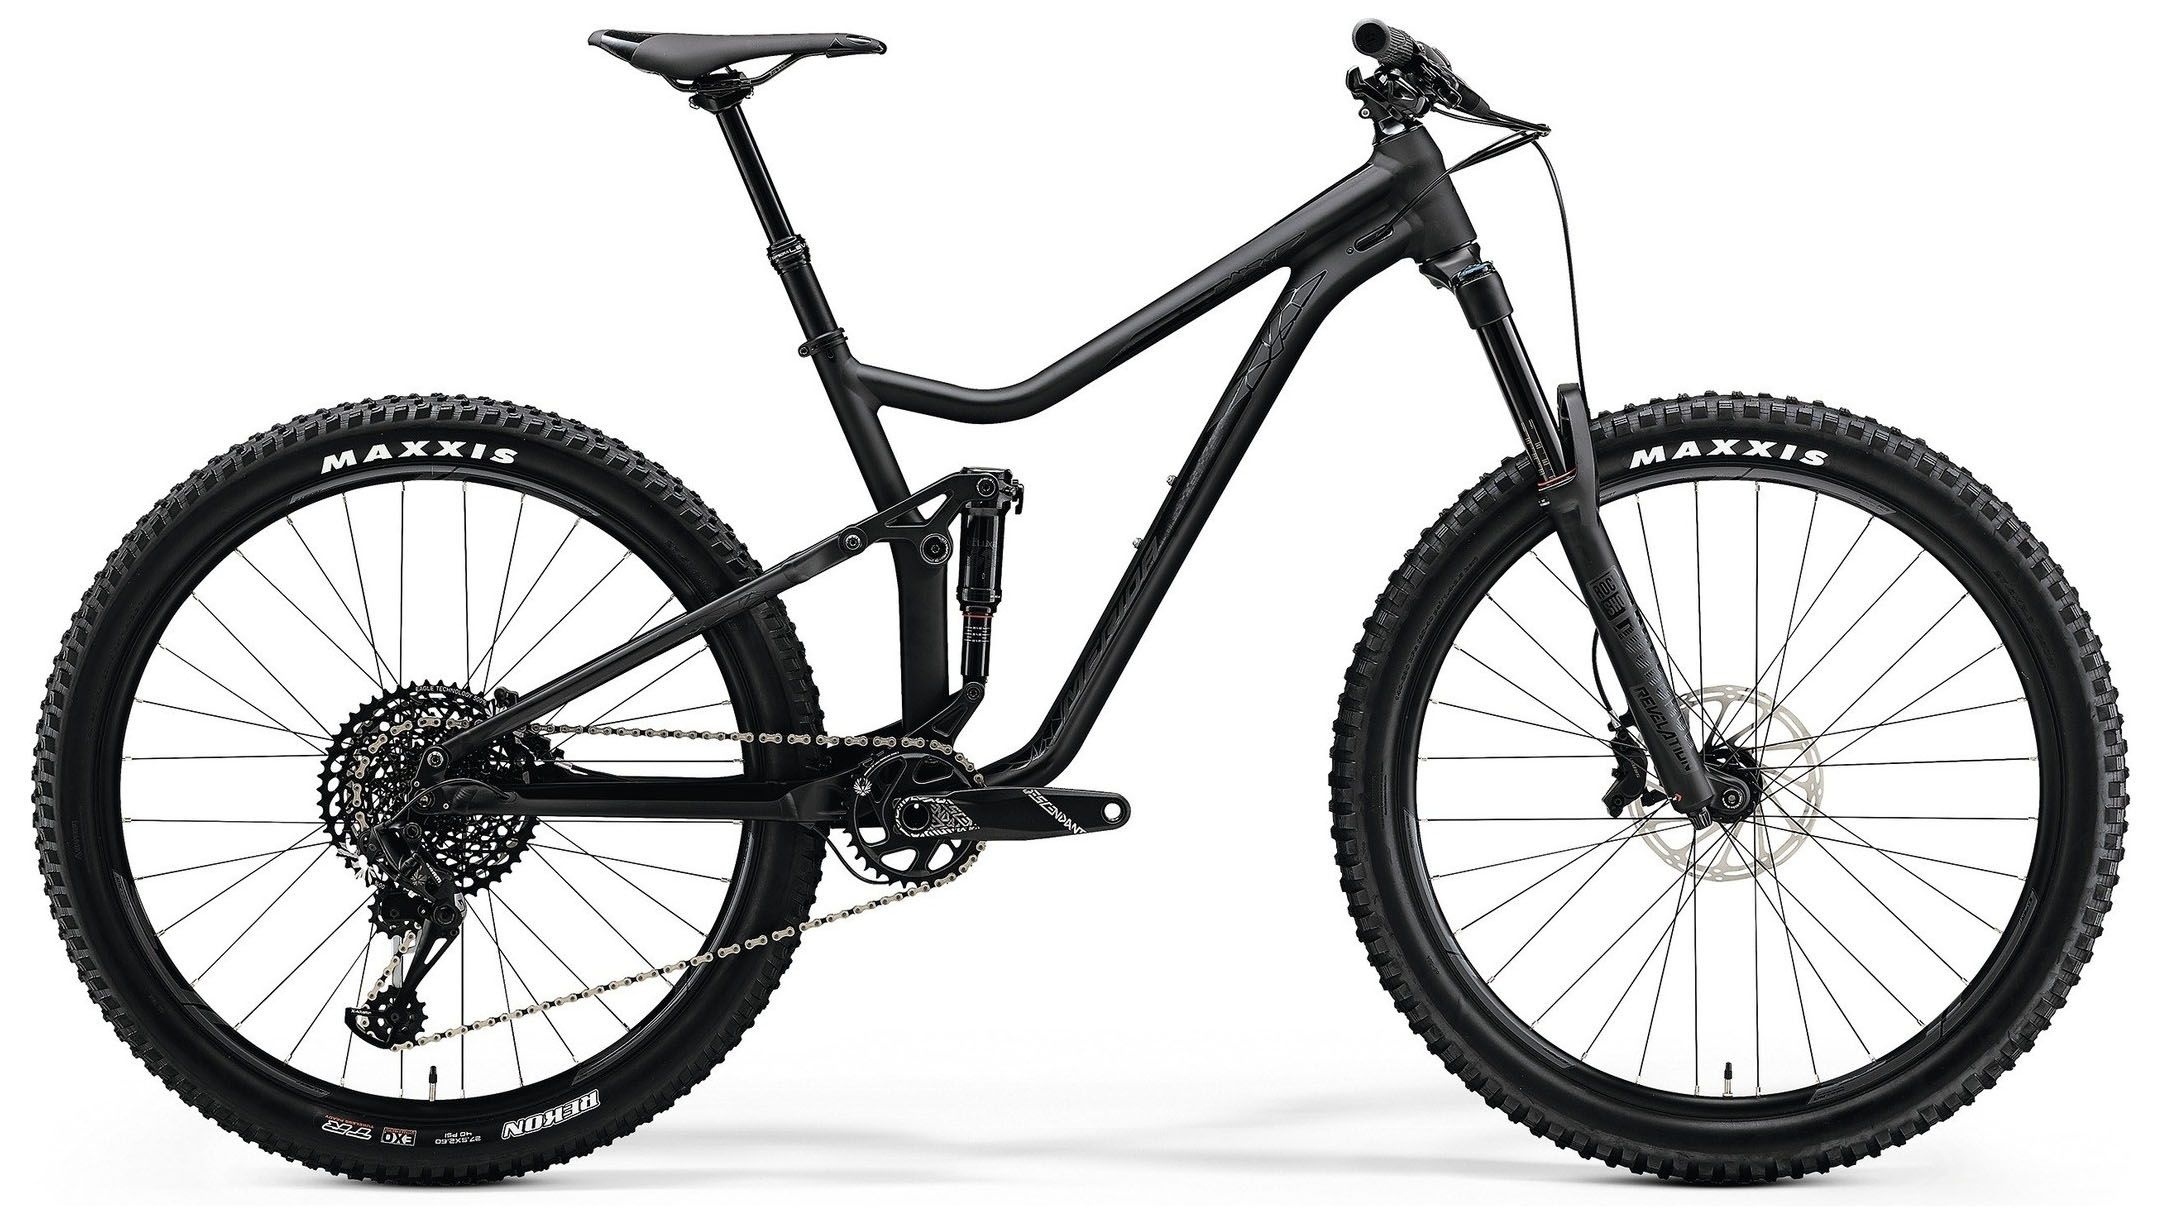 Велосипед Merida One-Forty 800 2018,  Двухподвесы  - артикул:287974